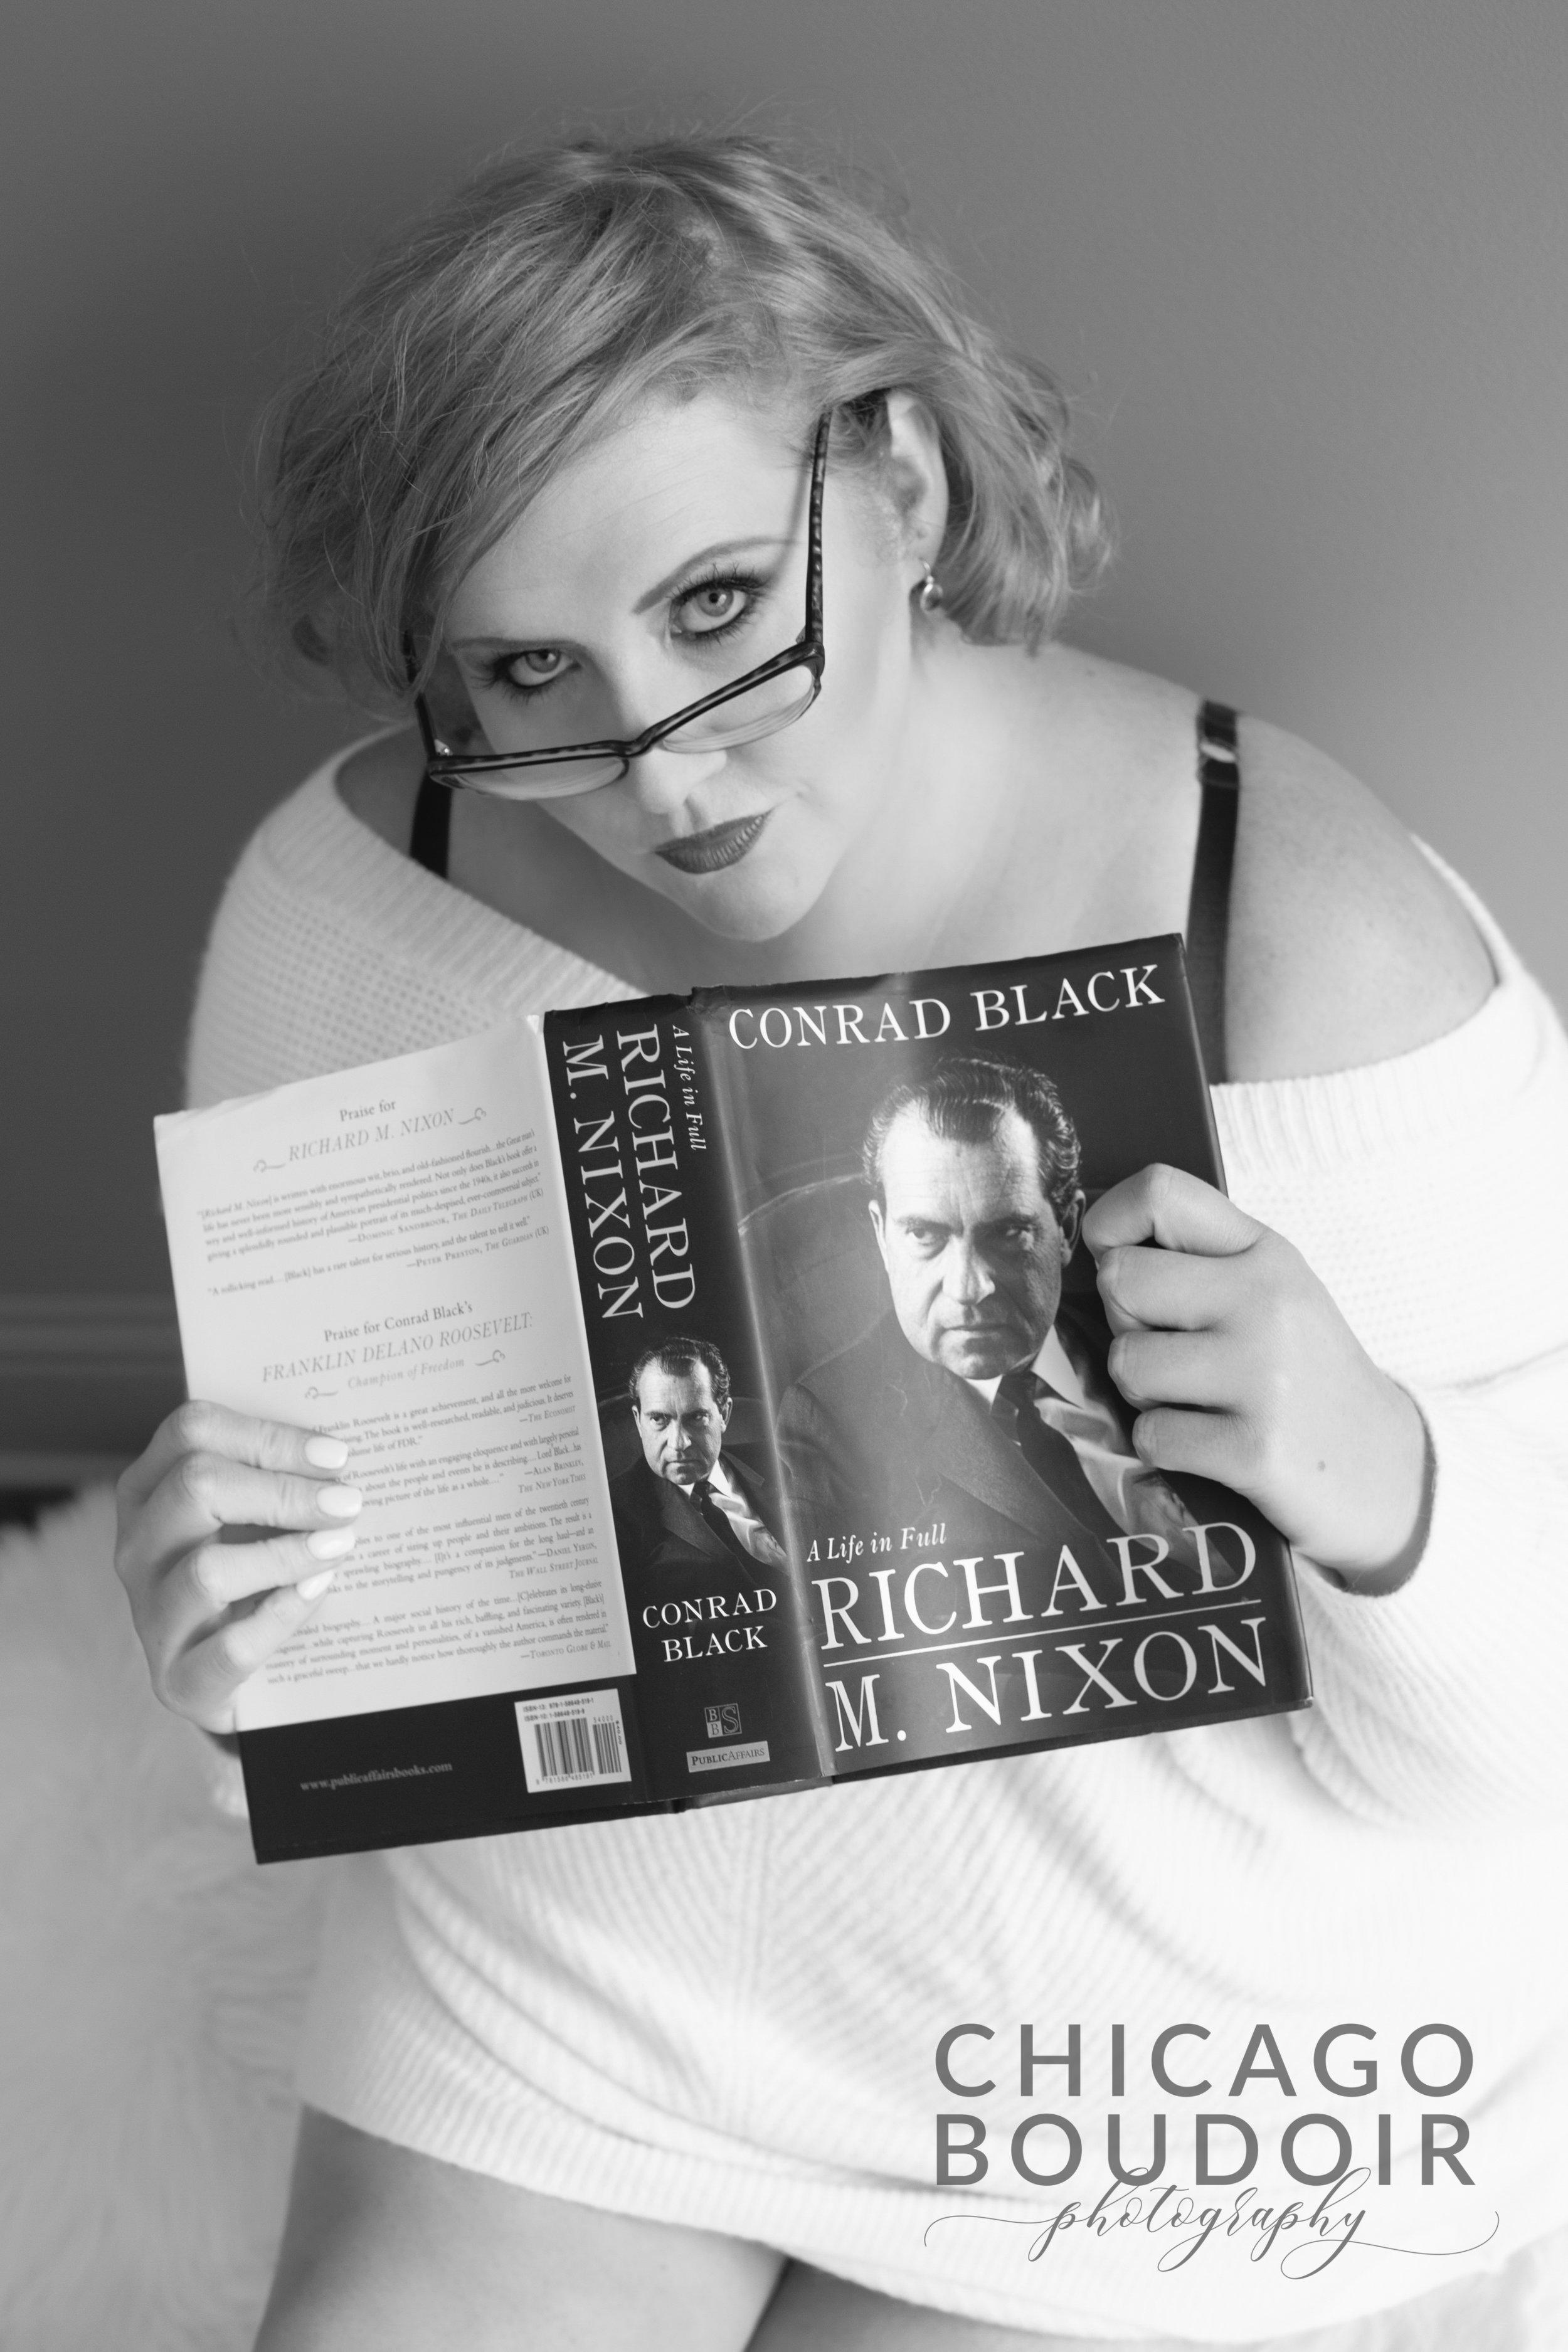 richard nixon book chicago boudoir